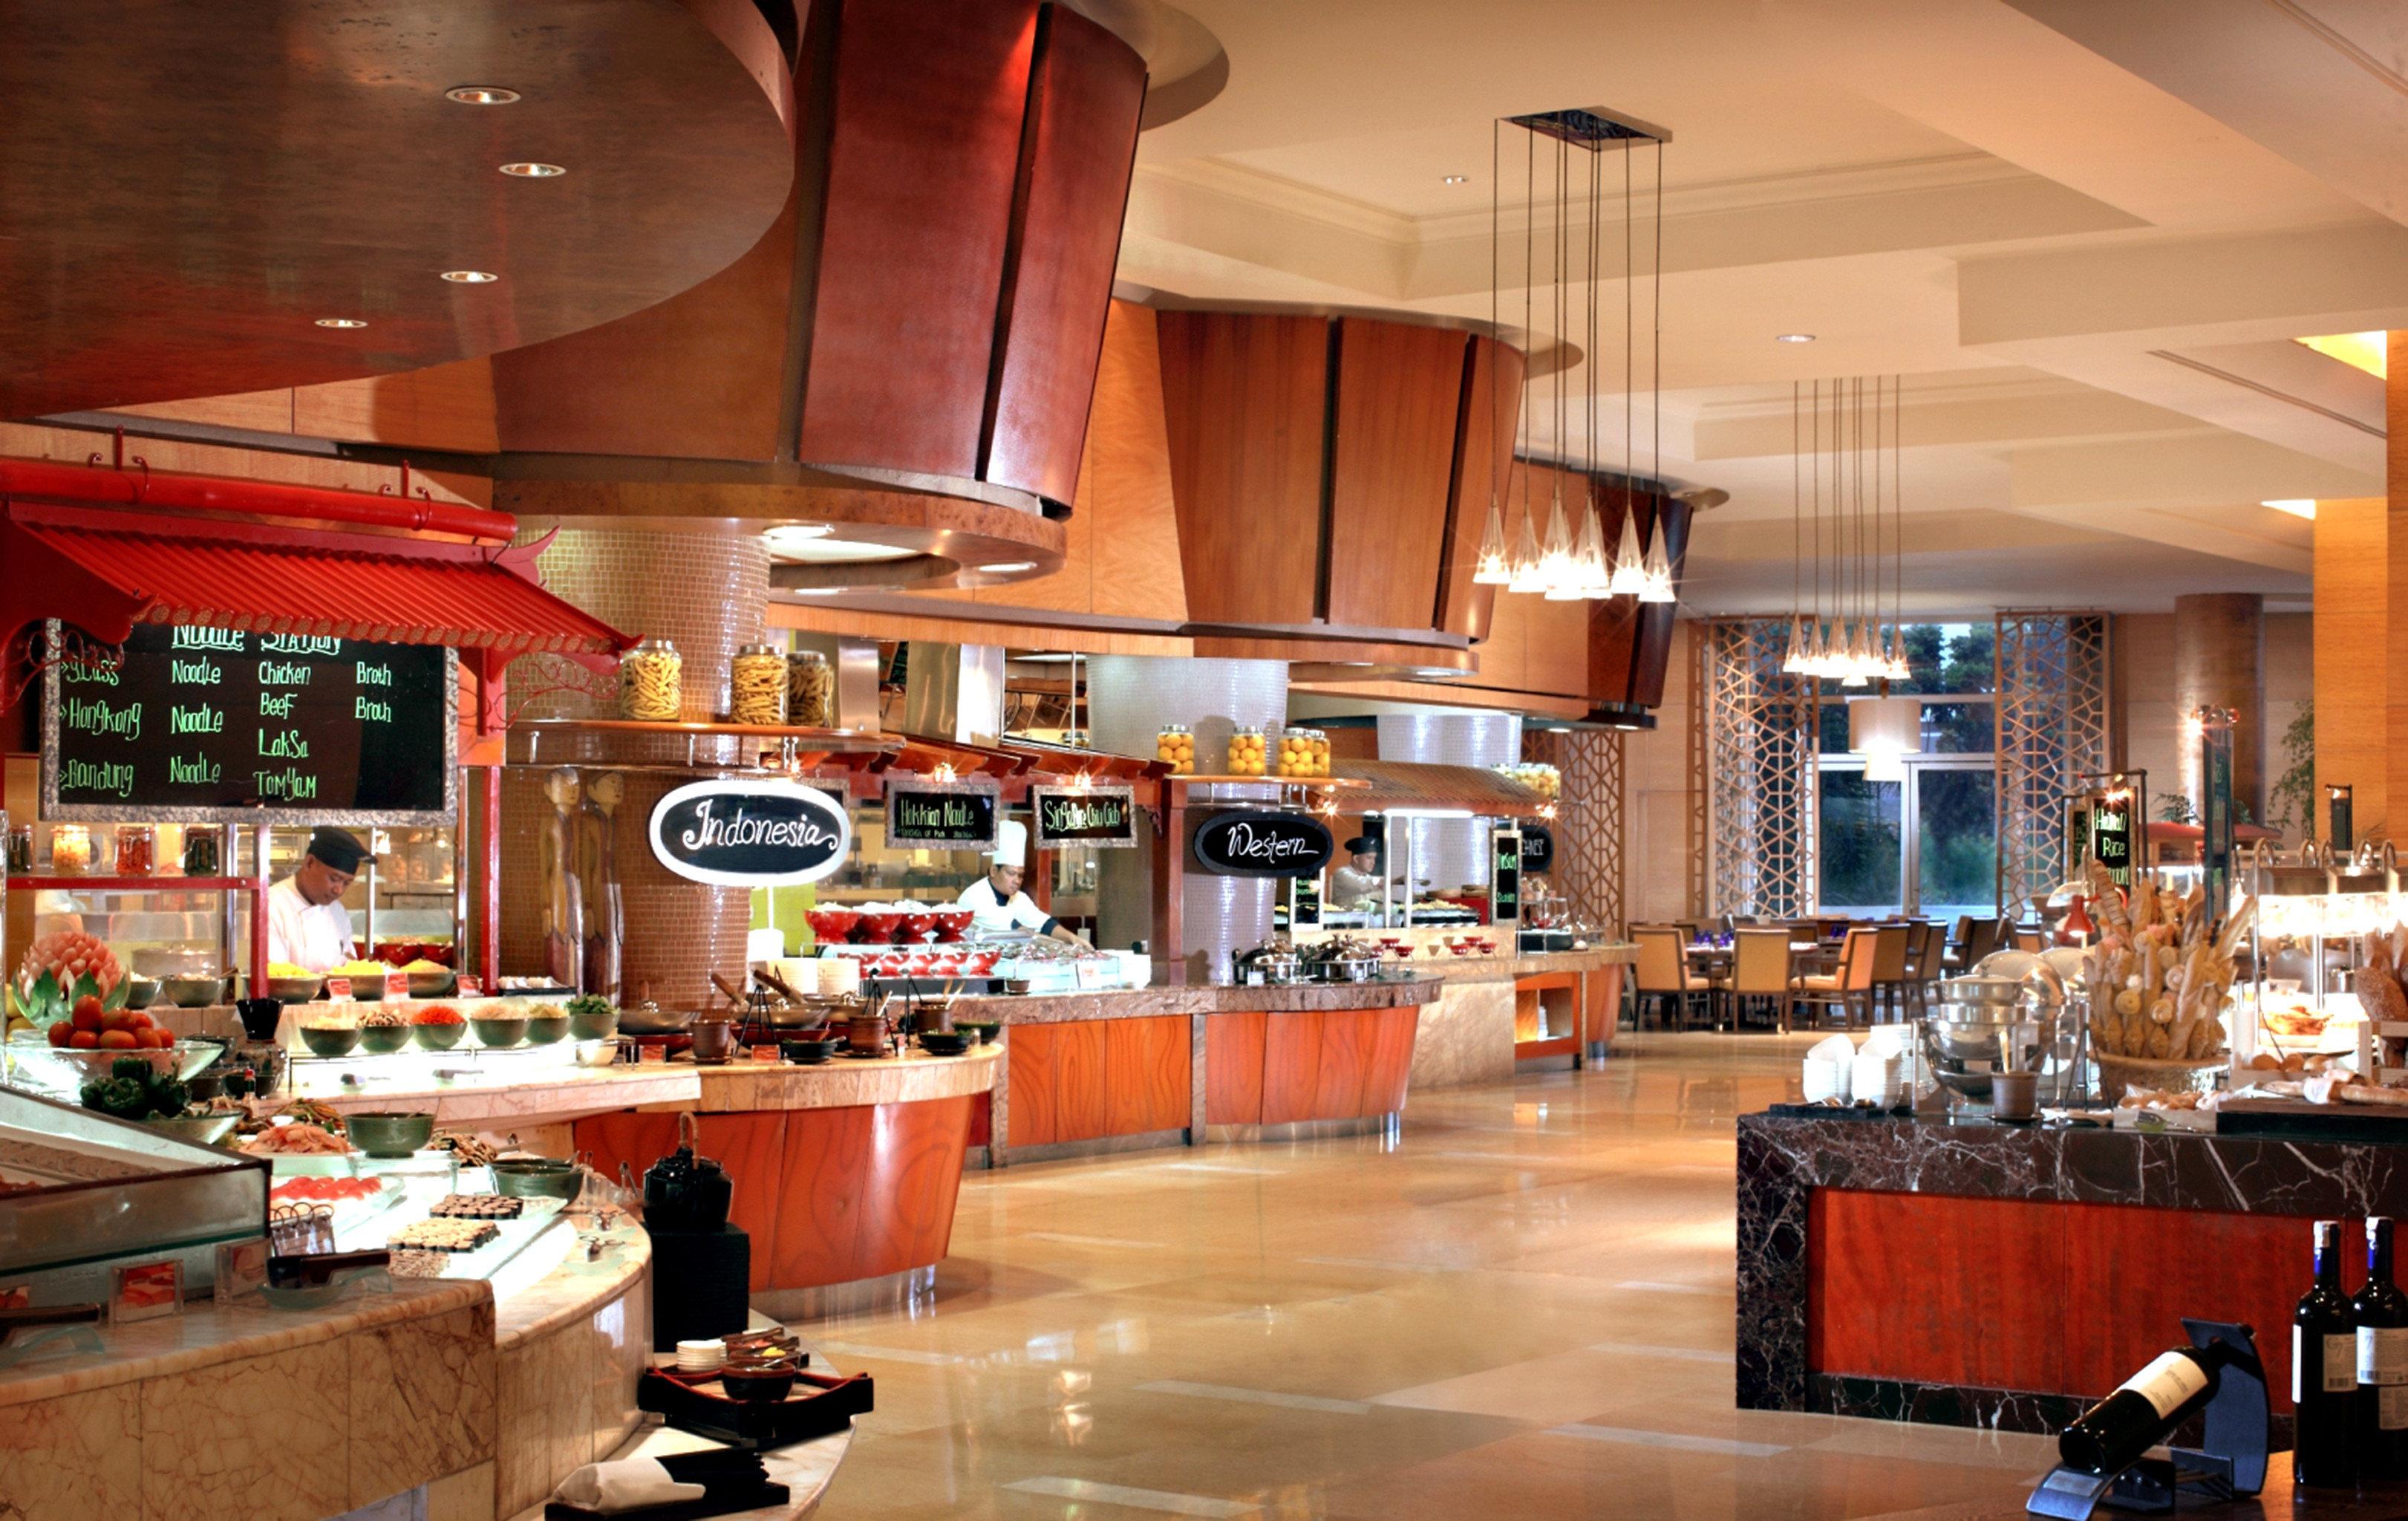 Bar Dining Drink Eat Elegant Hip Luxury Modern Kitchen restaurant counter café food court fast food restaurant cafeteria food Island